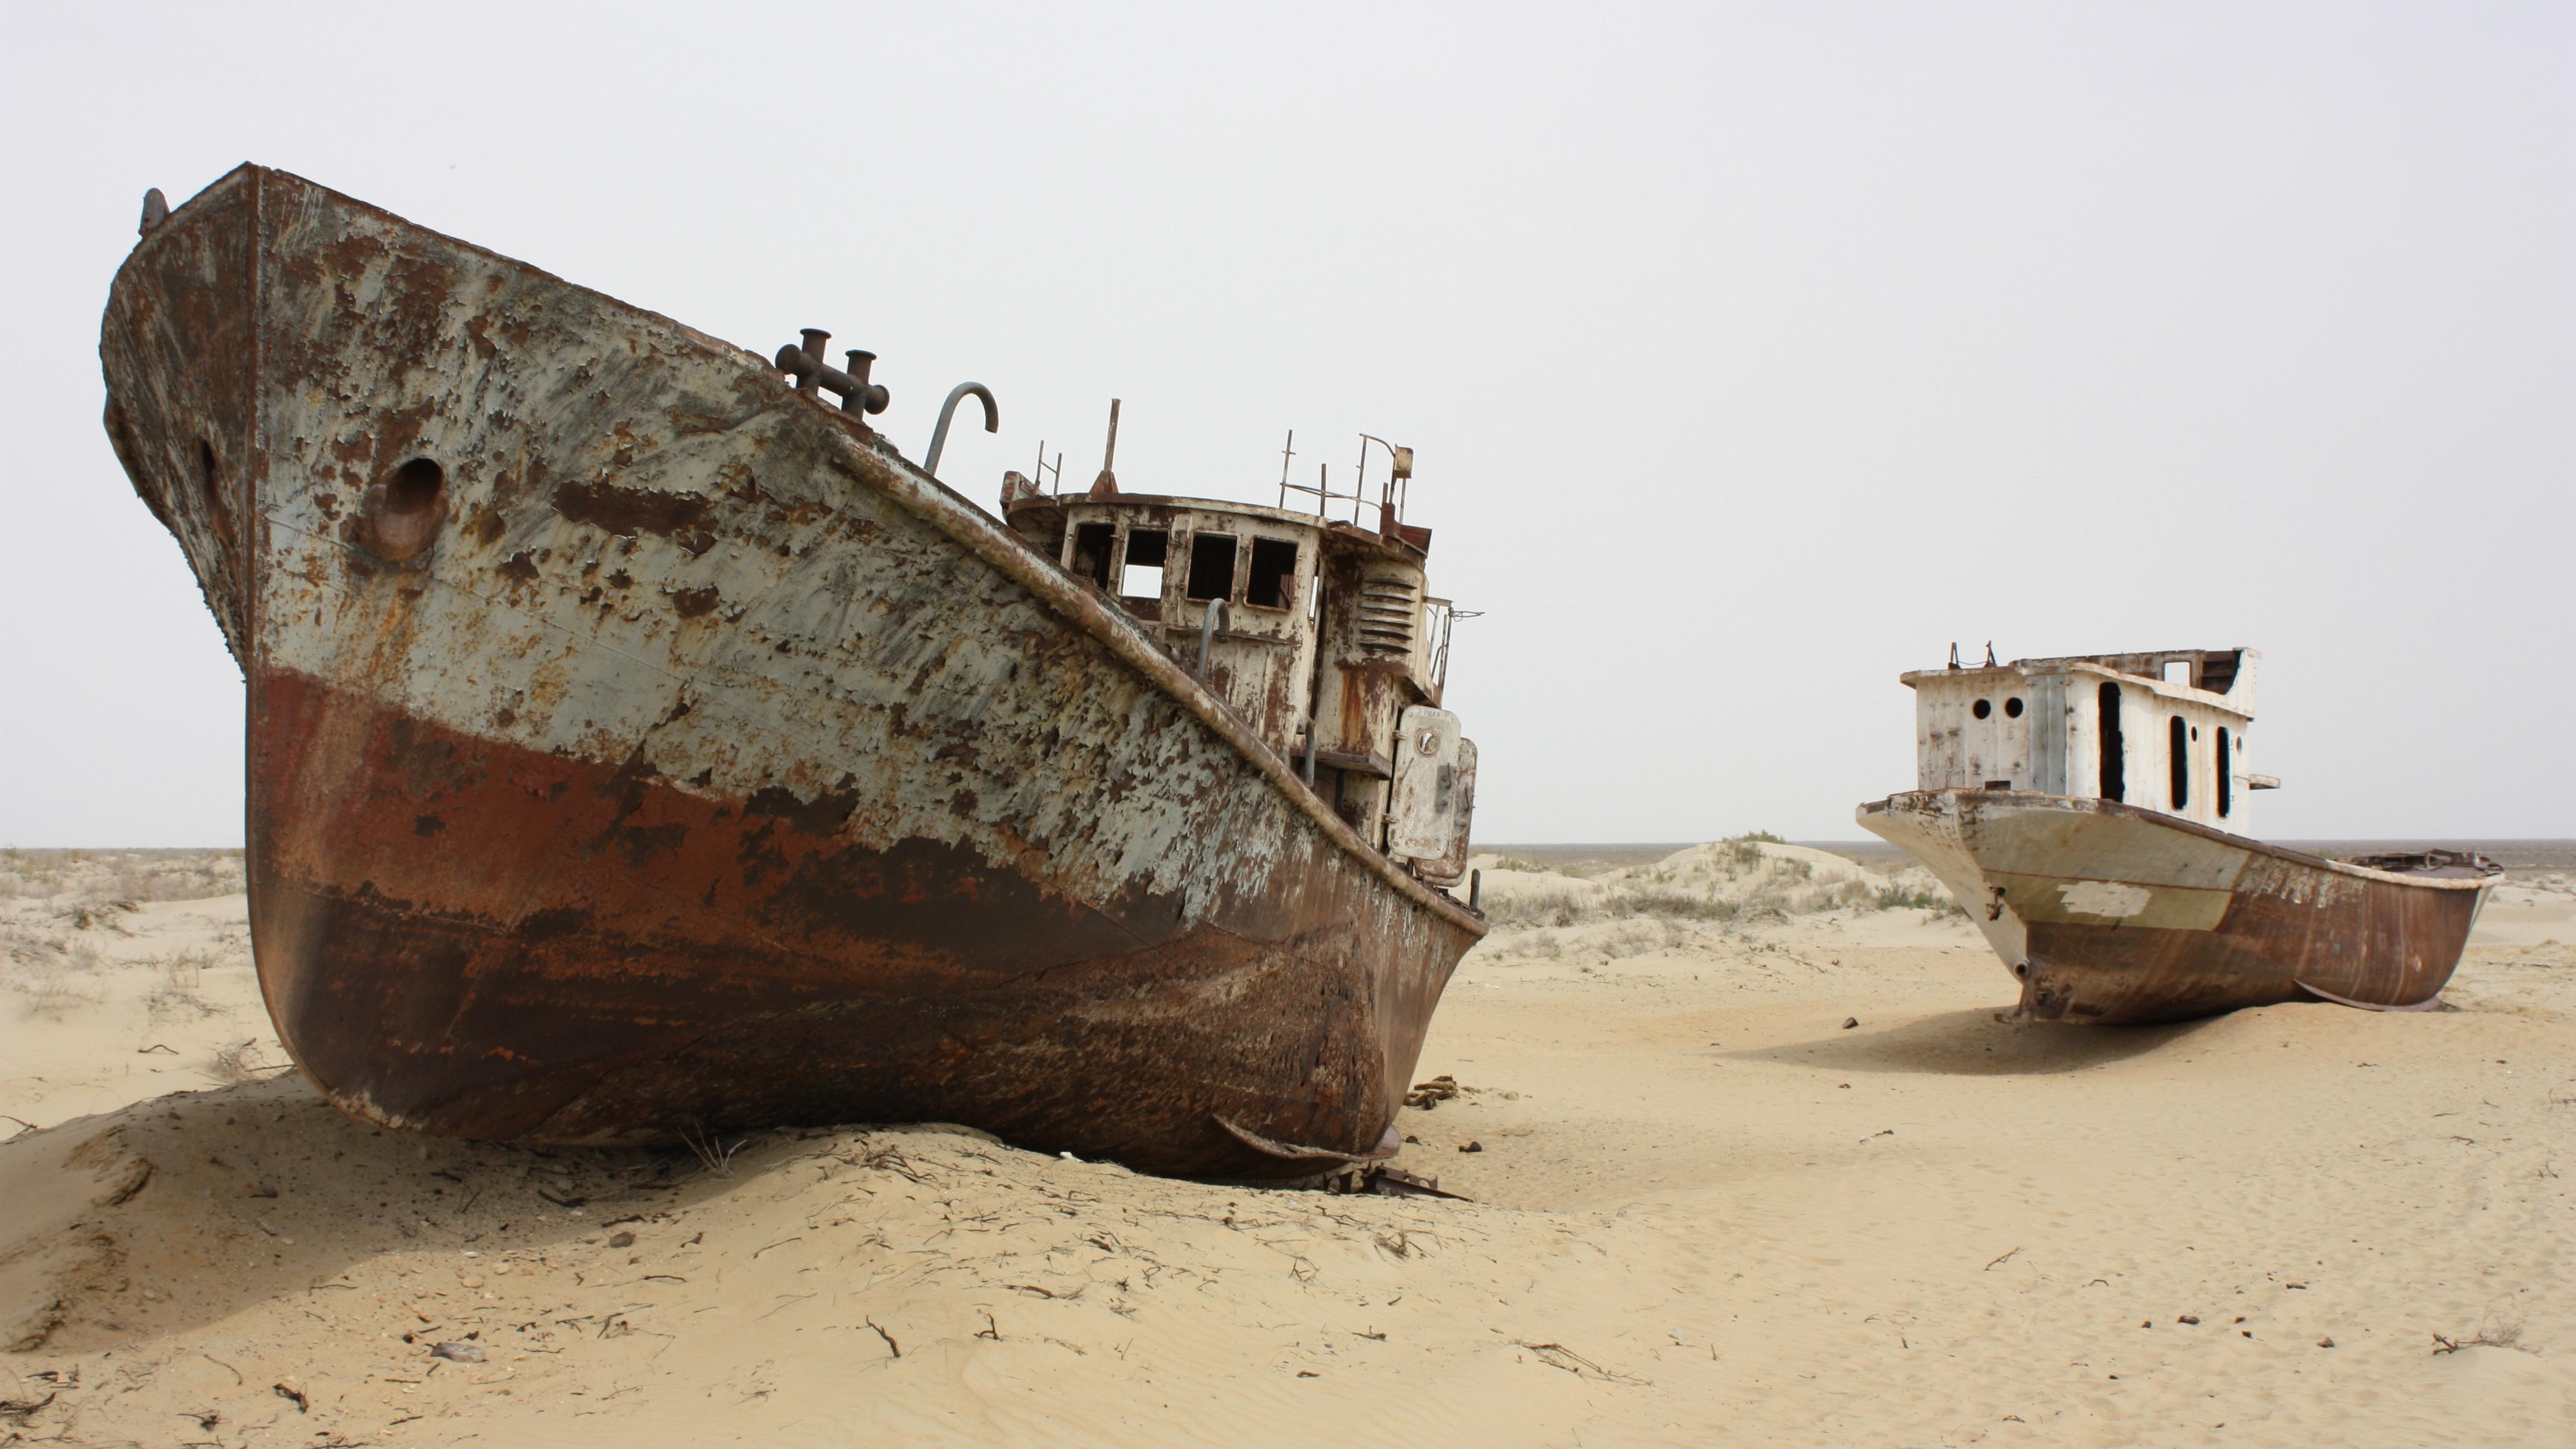 Ninety Percent of the World's Fourth-Largest Lake Has Gone Dry